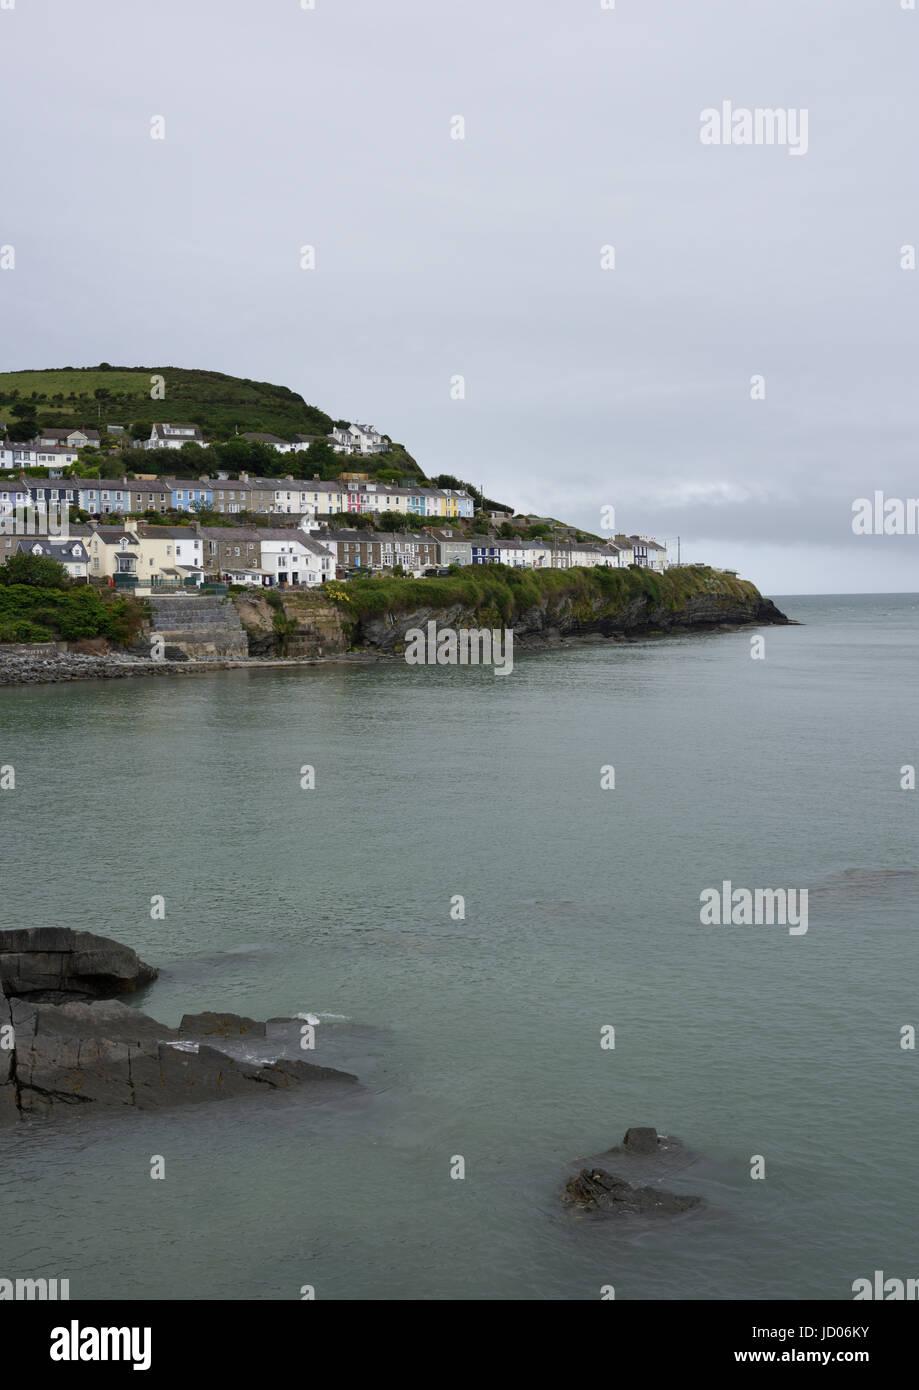 New quay cardigan bay wales - Stock Image